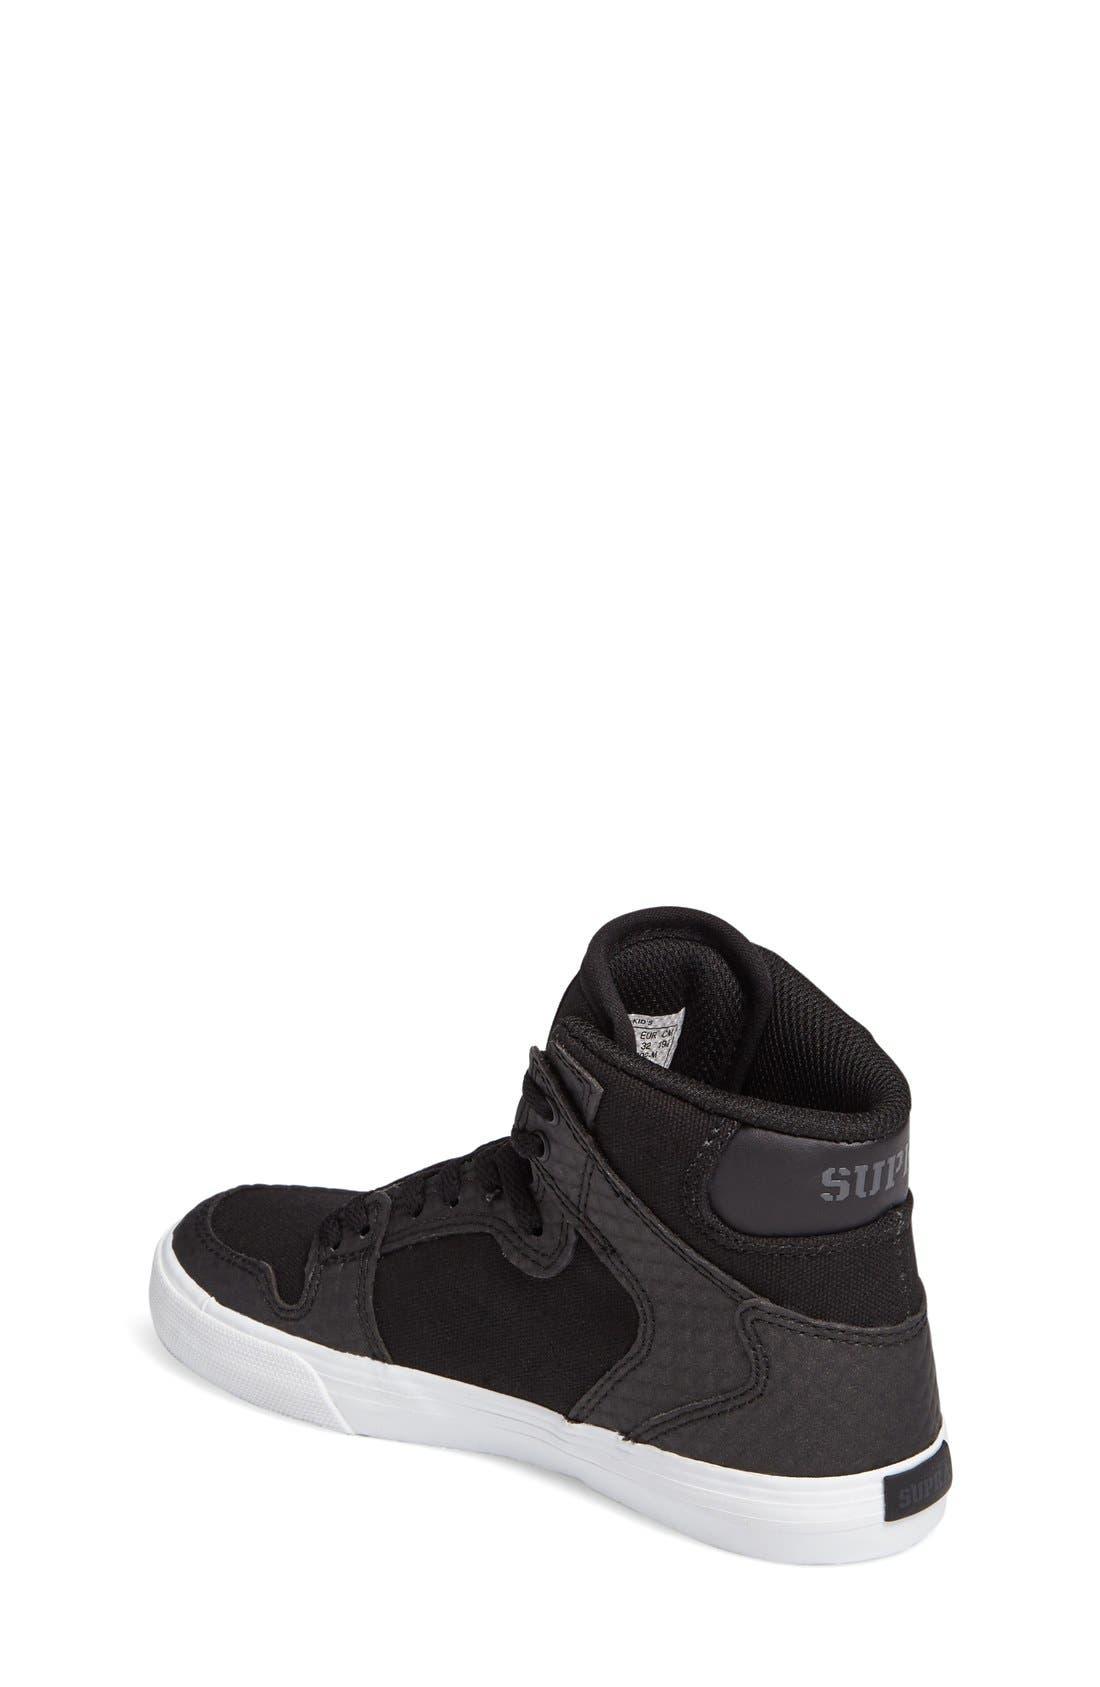 Alternate Image 2  - Supra 'Vaider' High Top Sneaker (Walker, Toddler, Little Kid & Big Kid)